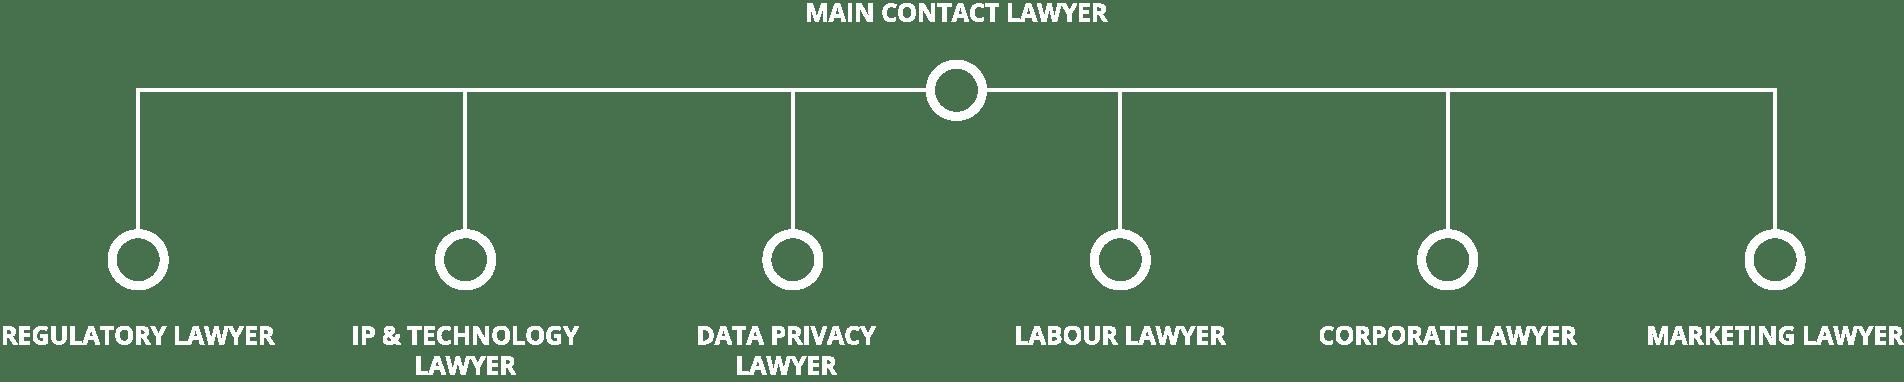 legalpartner-contact